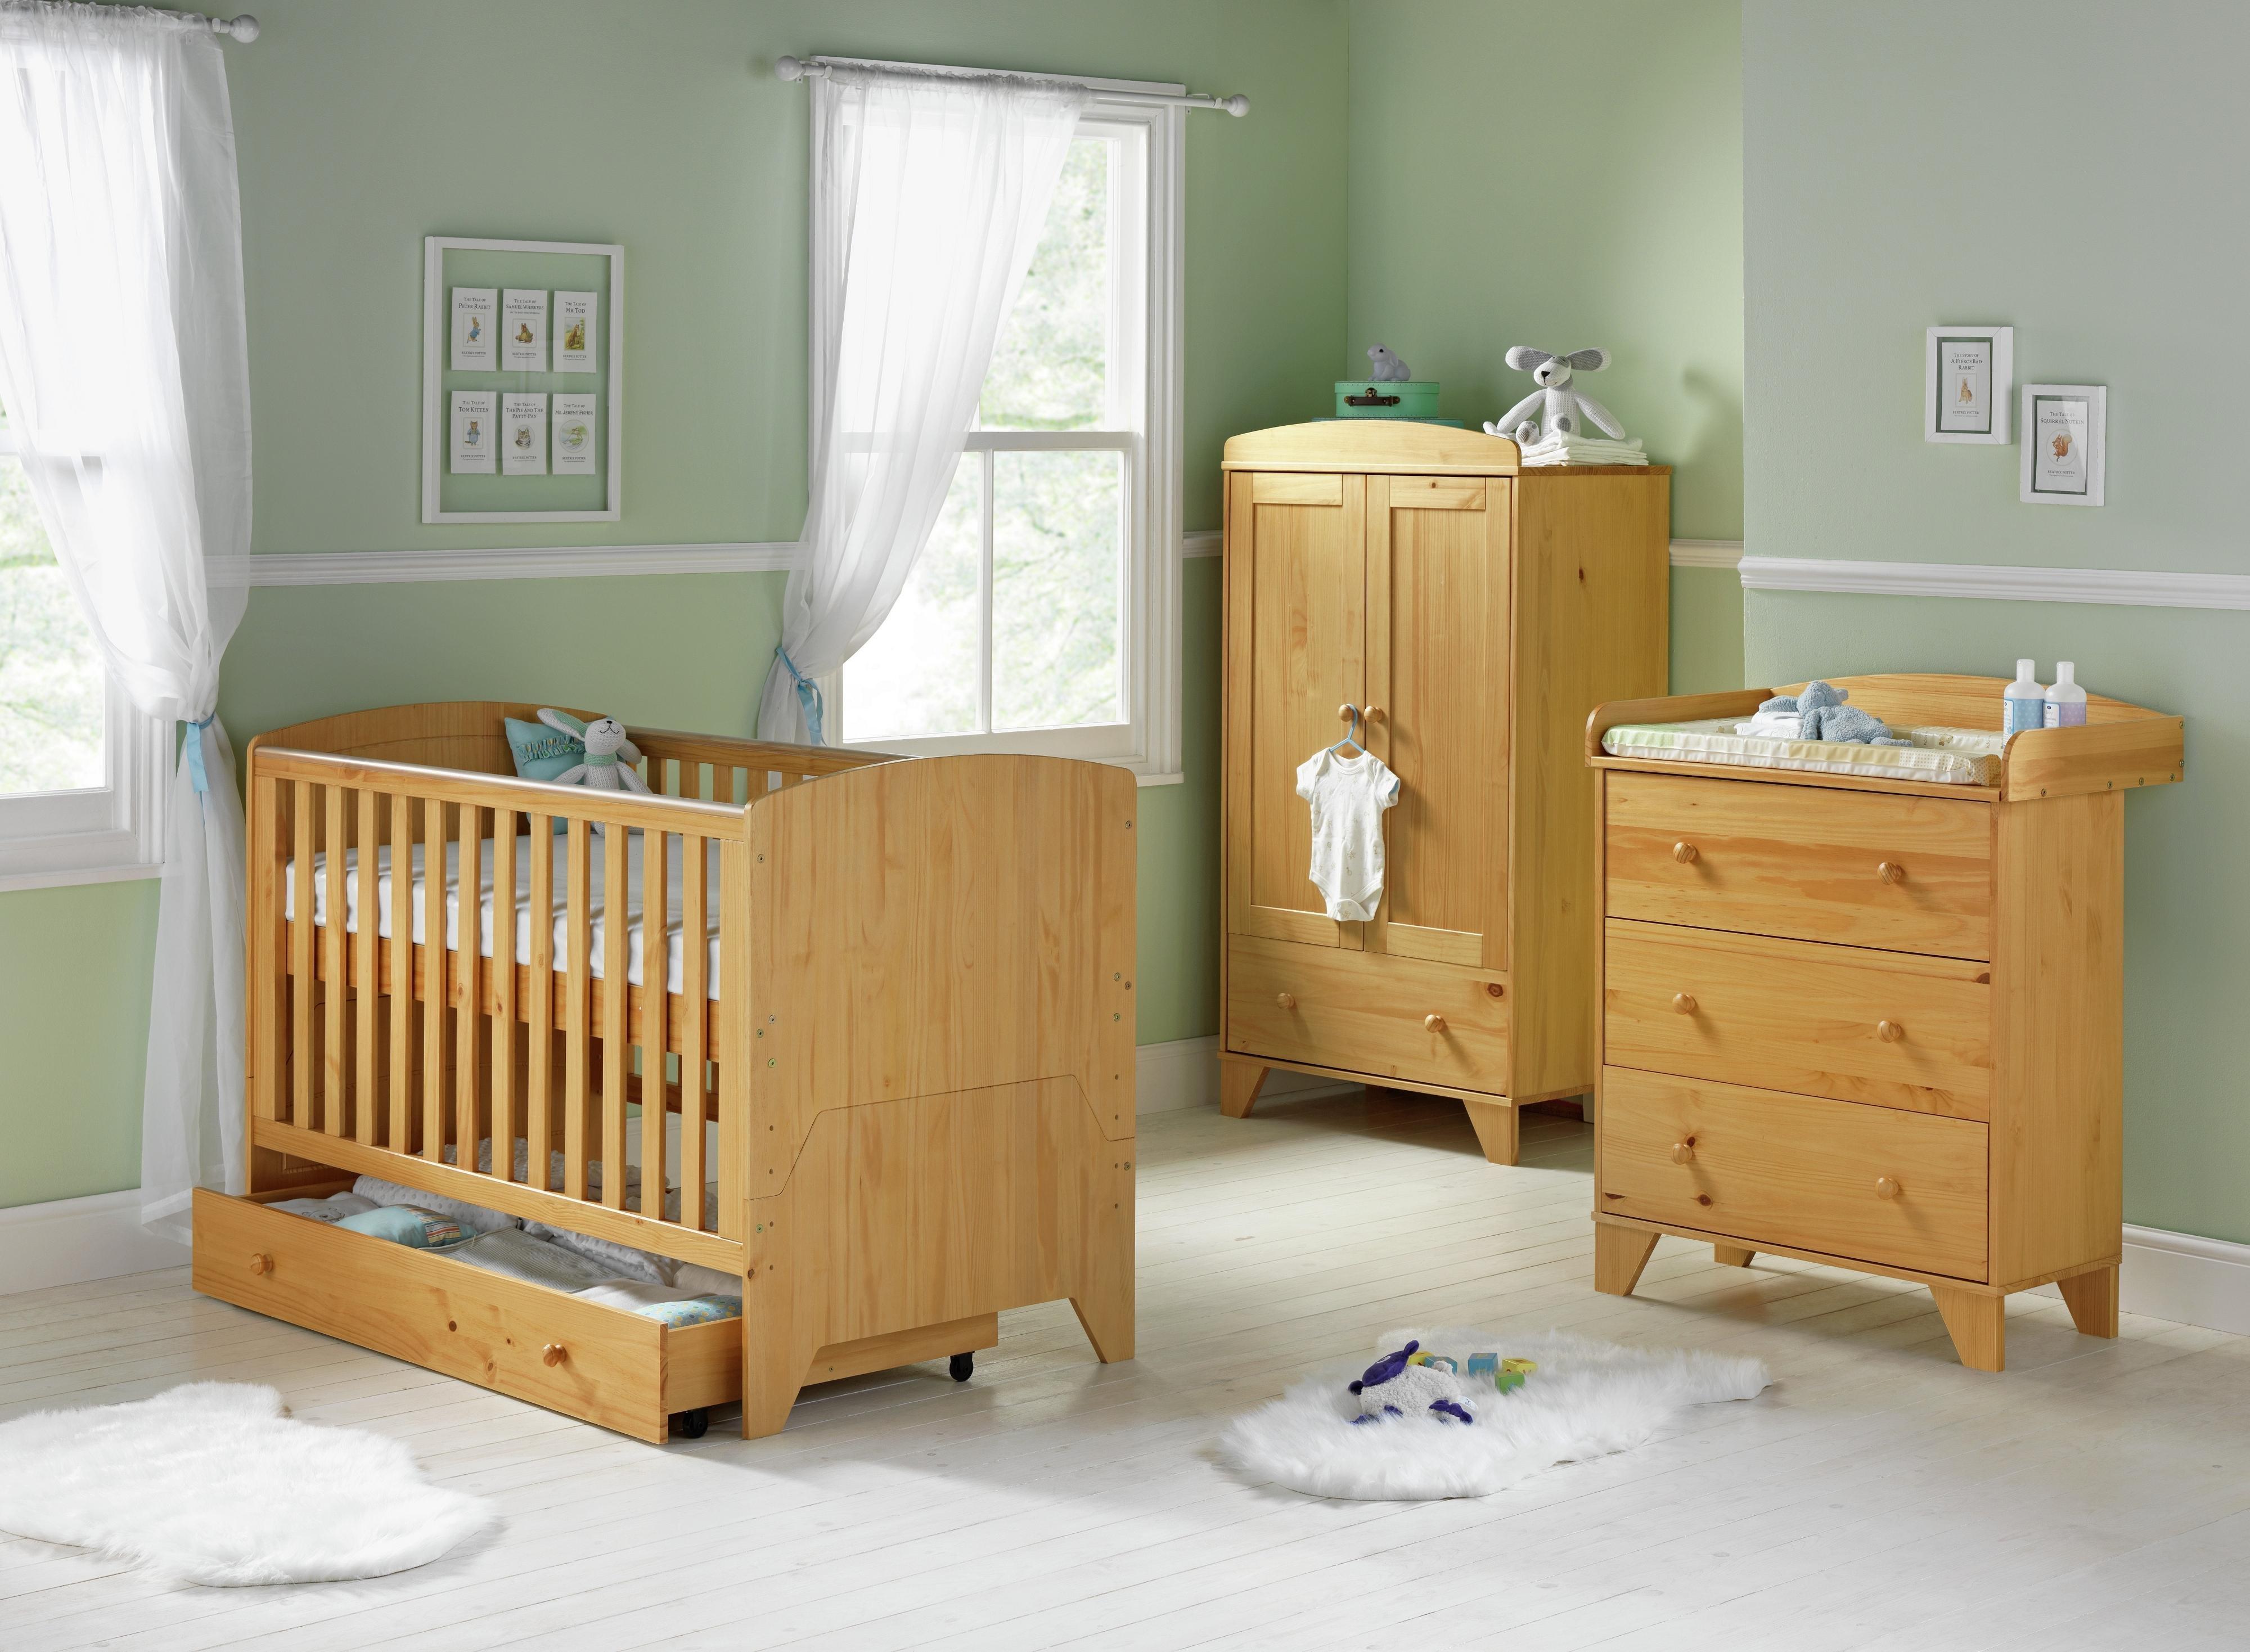 Mamas And Papas Bedroom Furniture Buy Mamas Papas Nursery Furniture Sets At Argoscouk Your